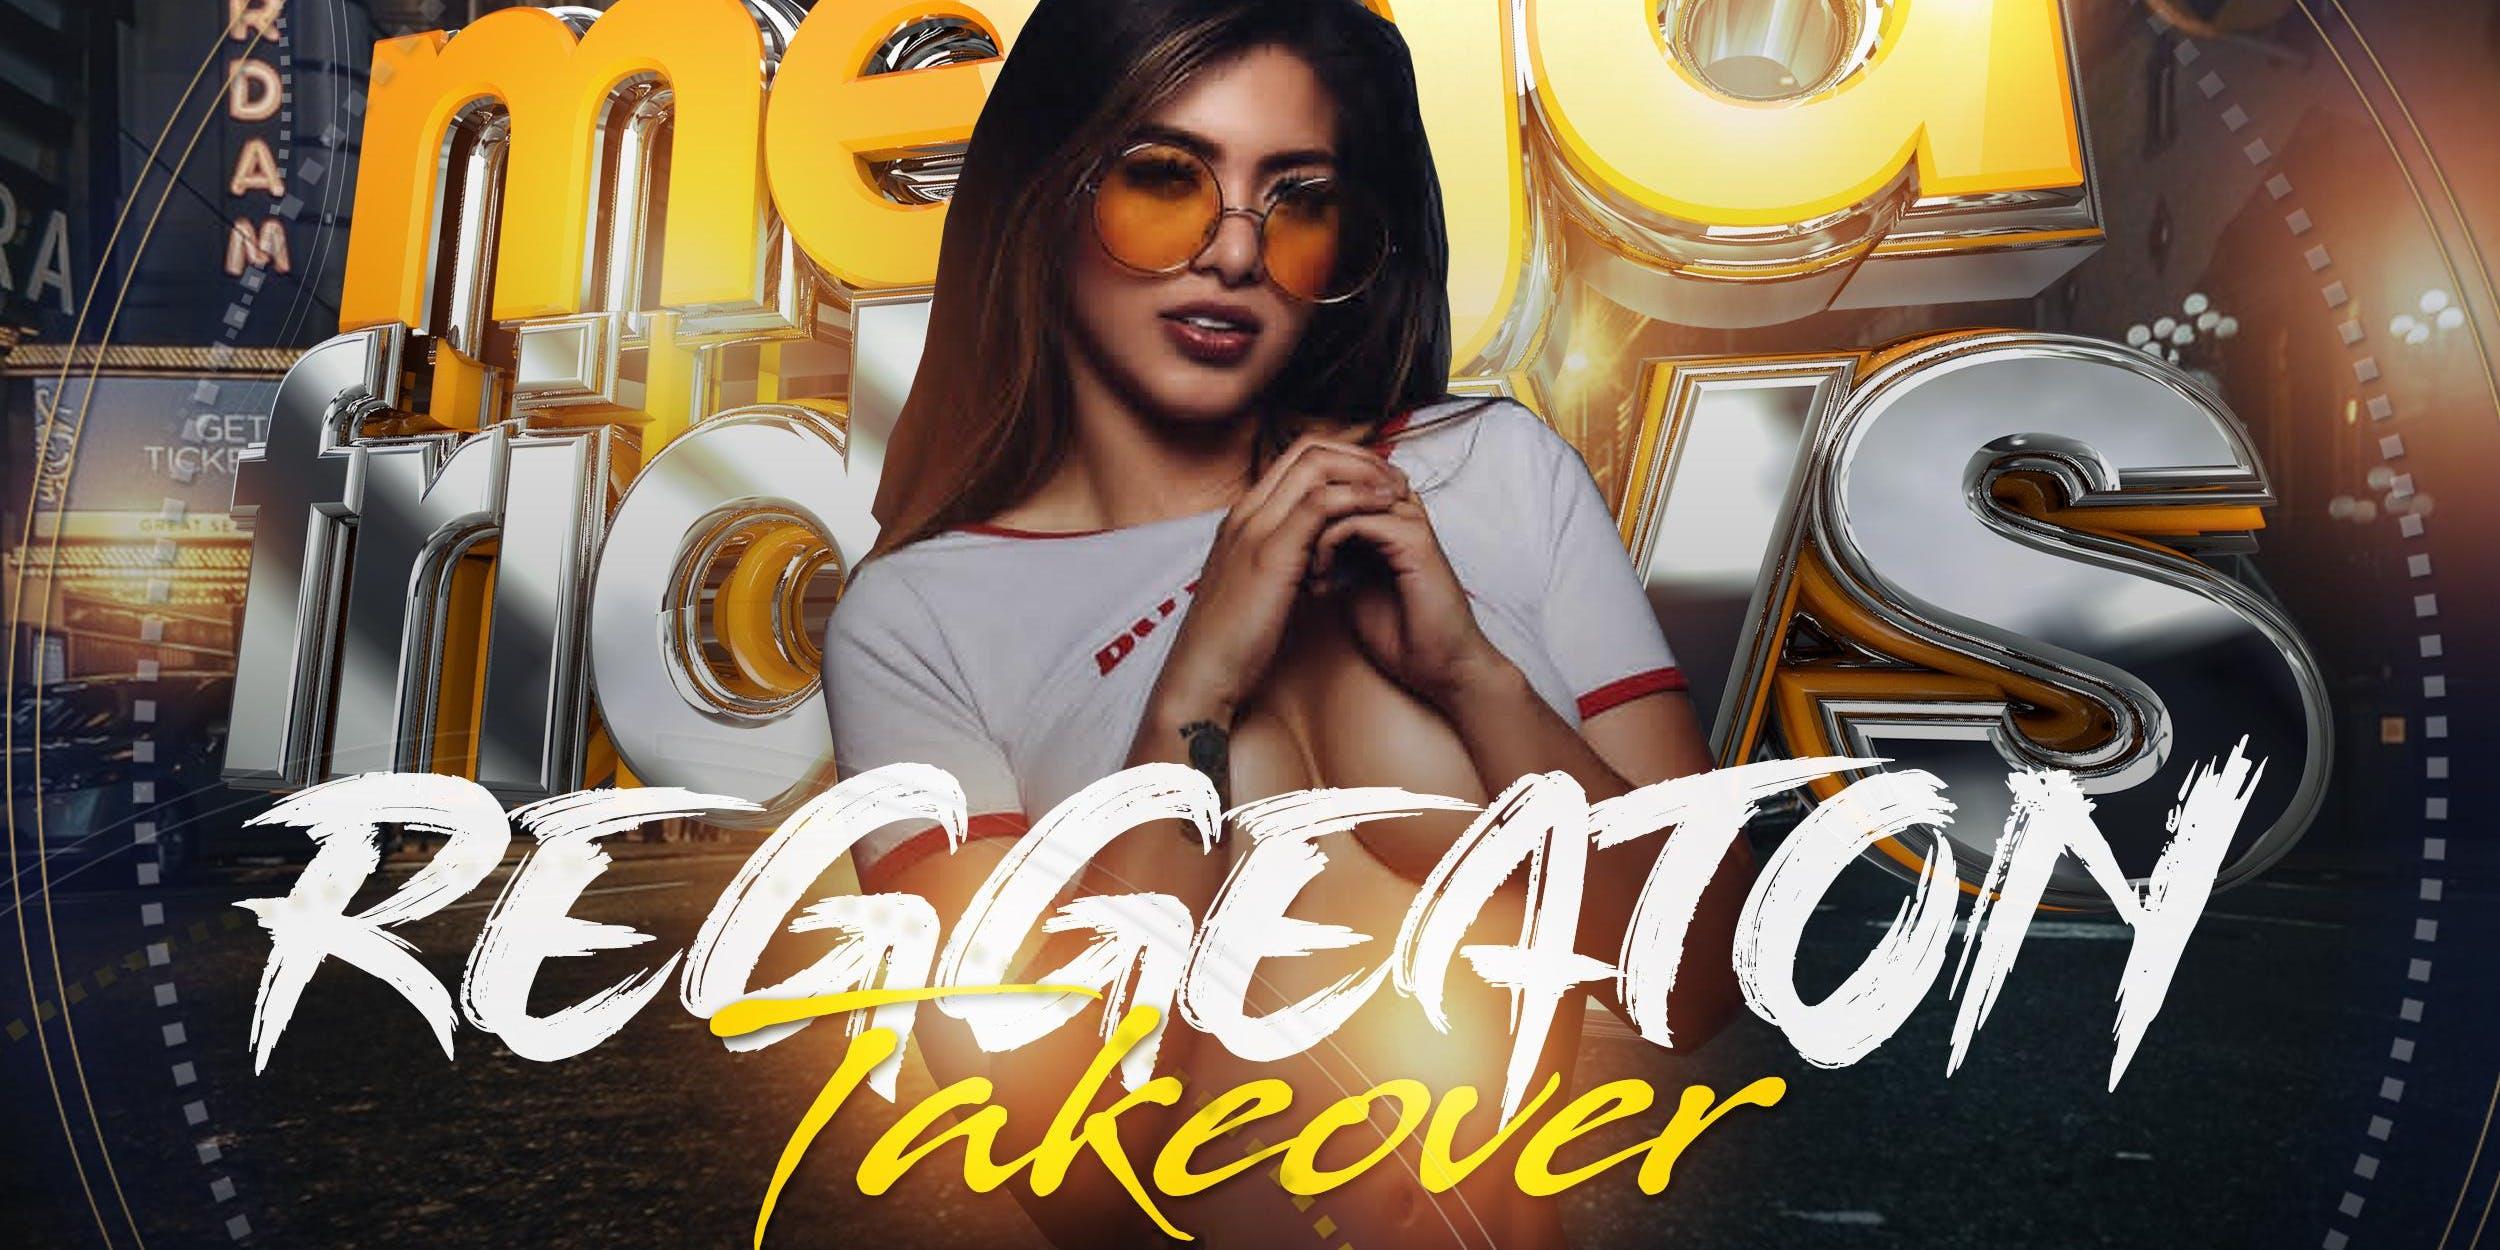 Mega Fridays - Latin Fridays In Charlotte - Reggeaton Takeover